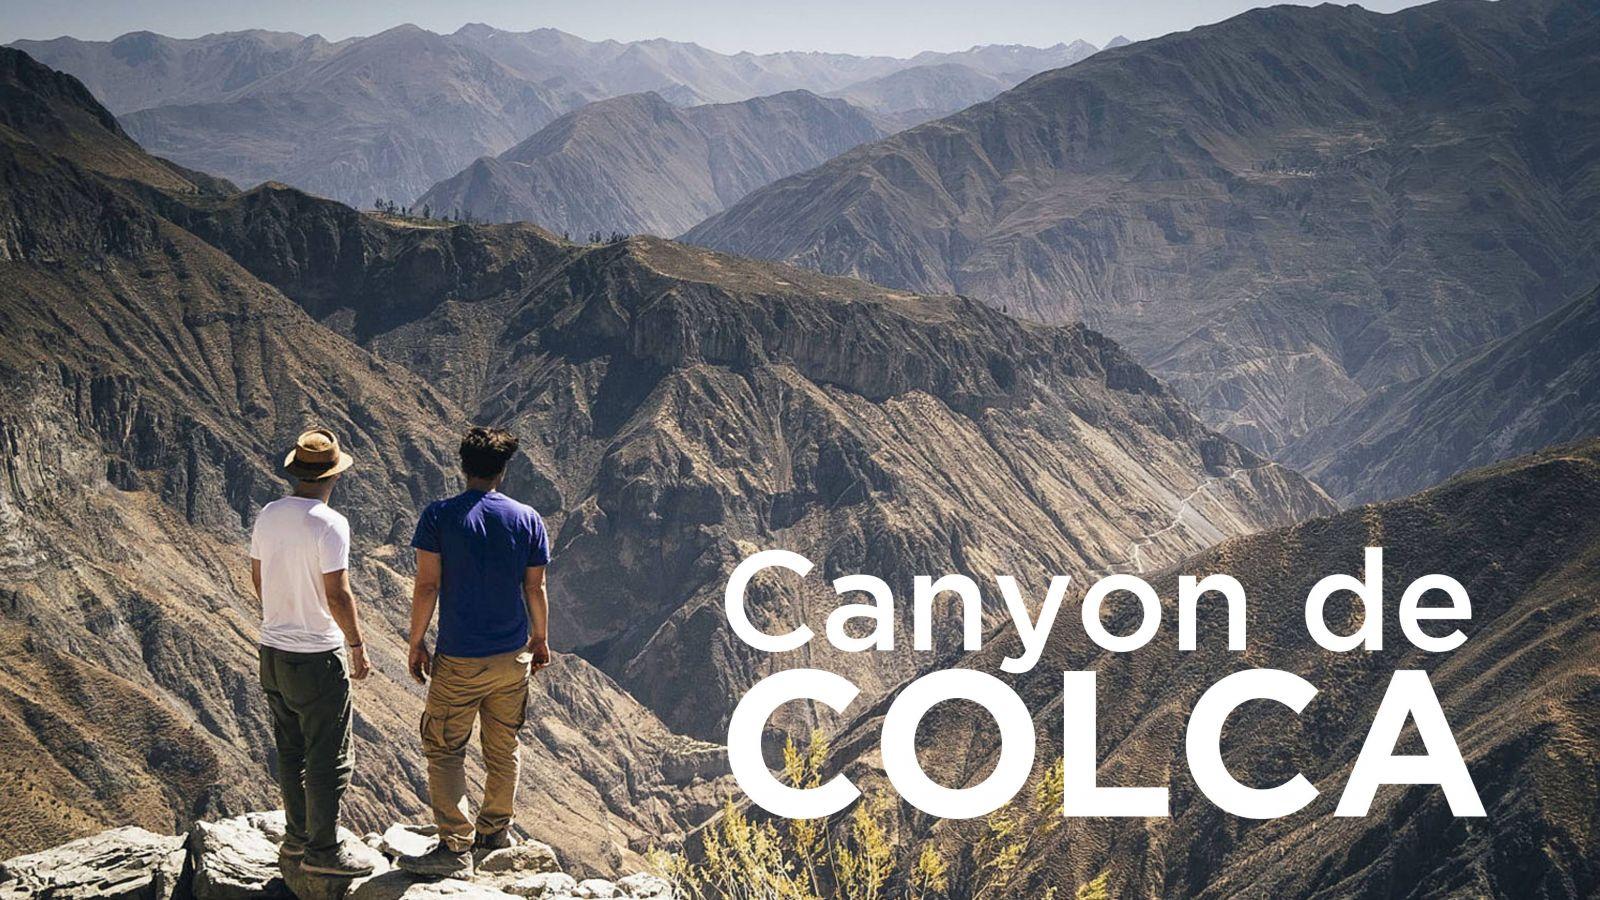 Voyage initiatique Canyon de Colca